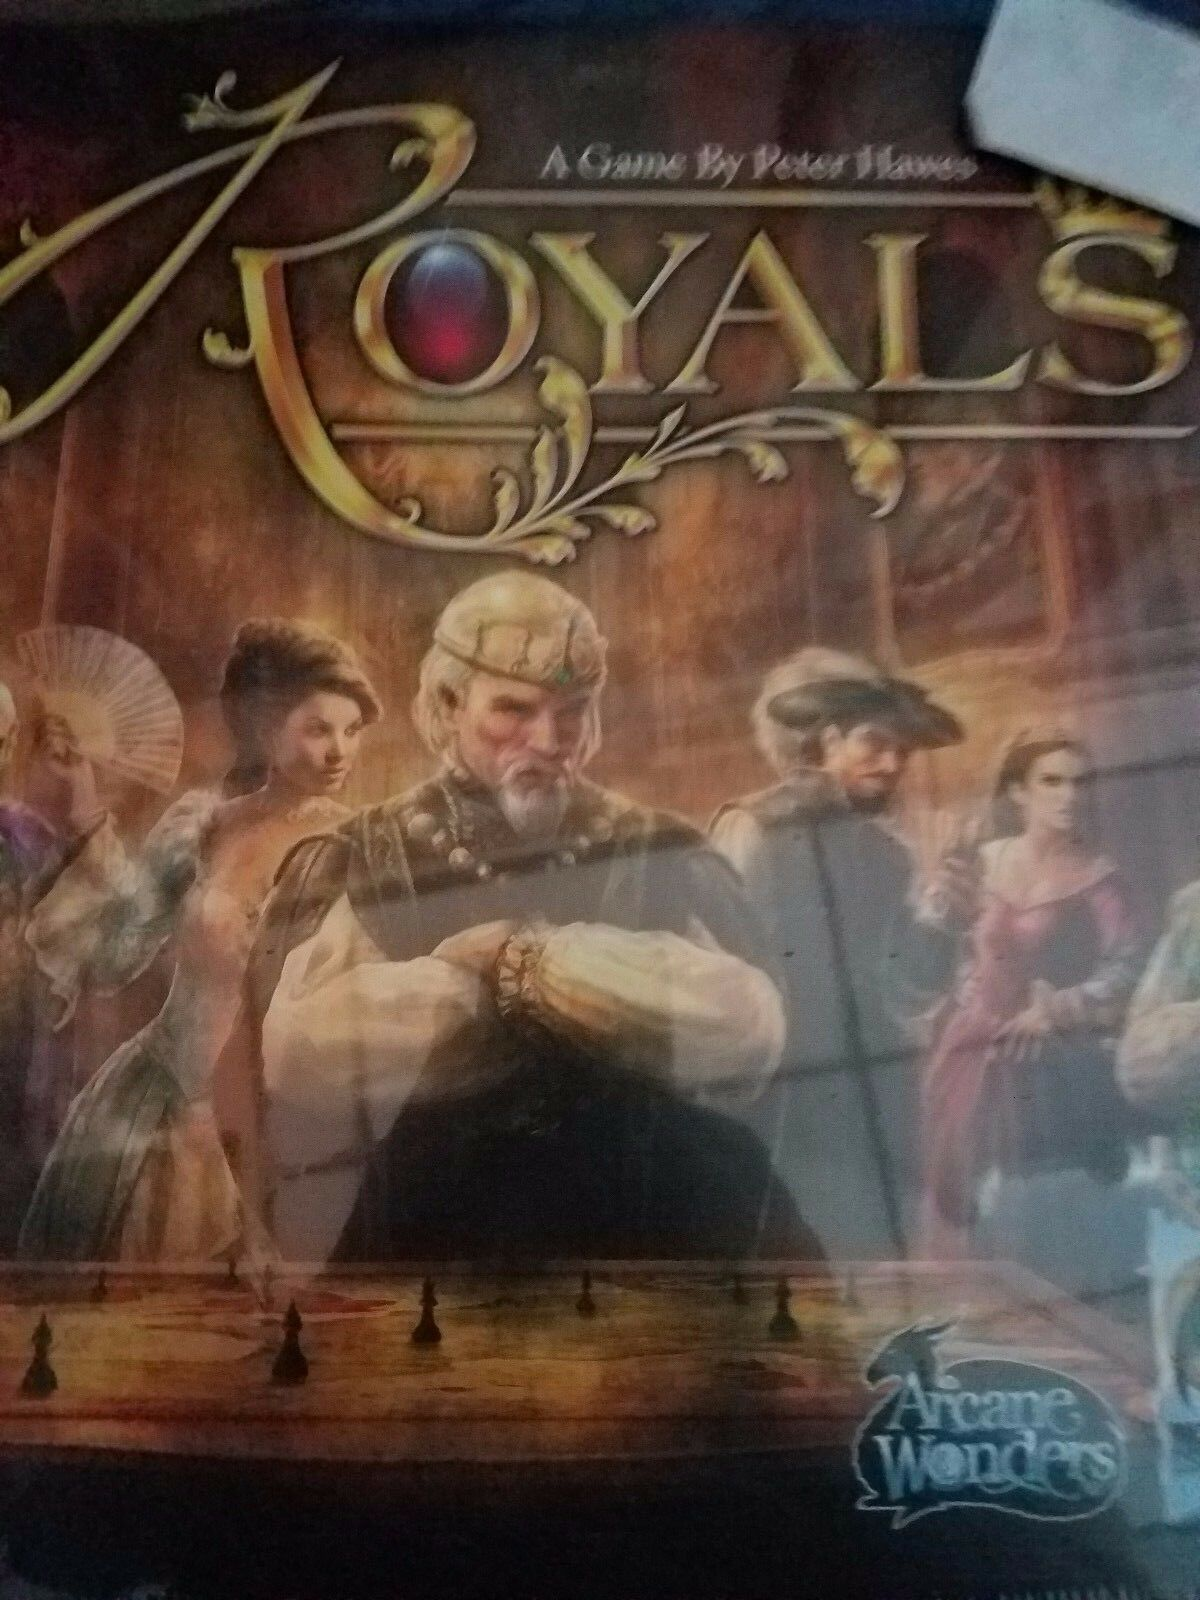 Royals - Arcane Wonders Games Board Game New